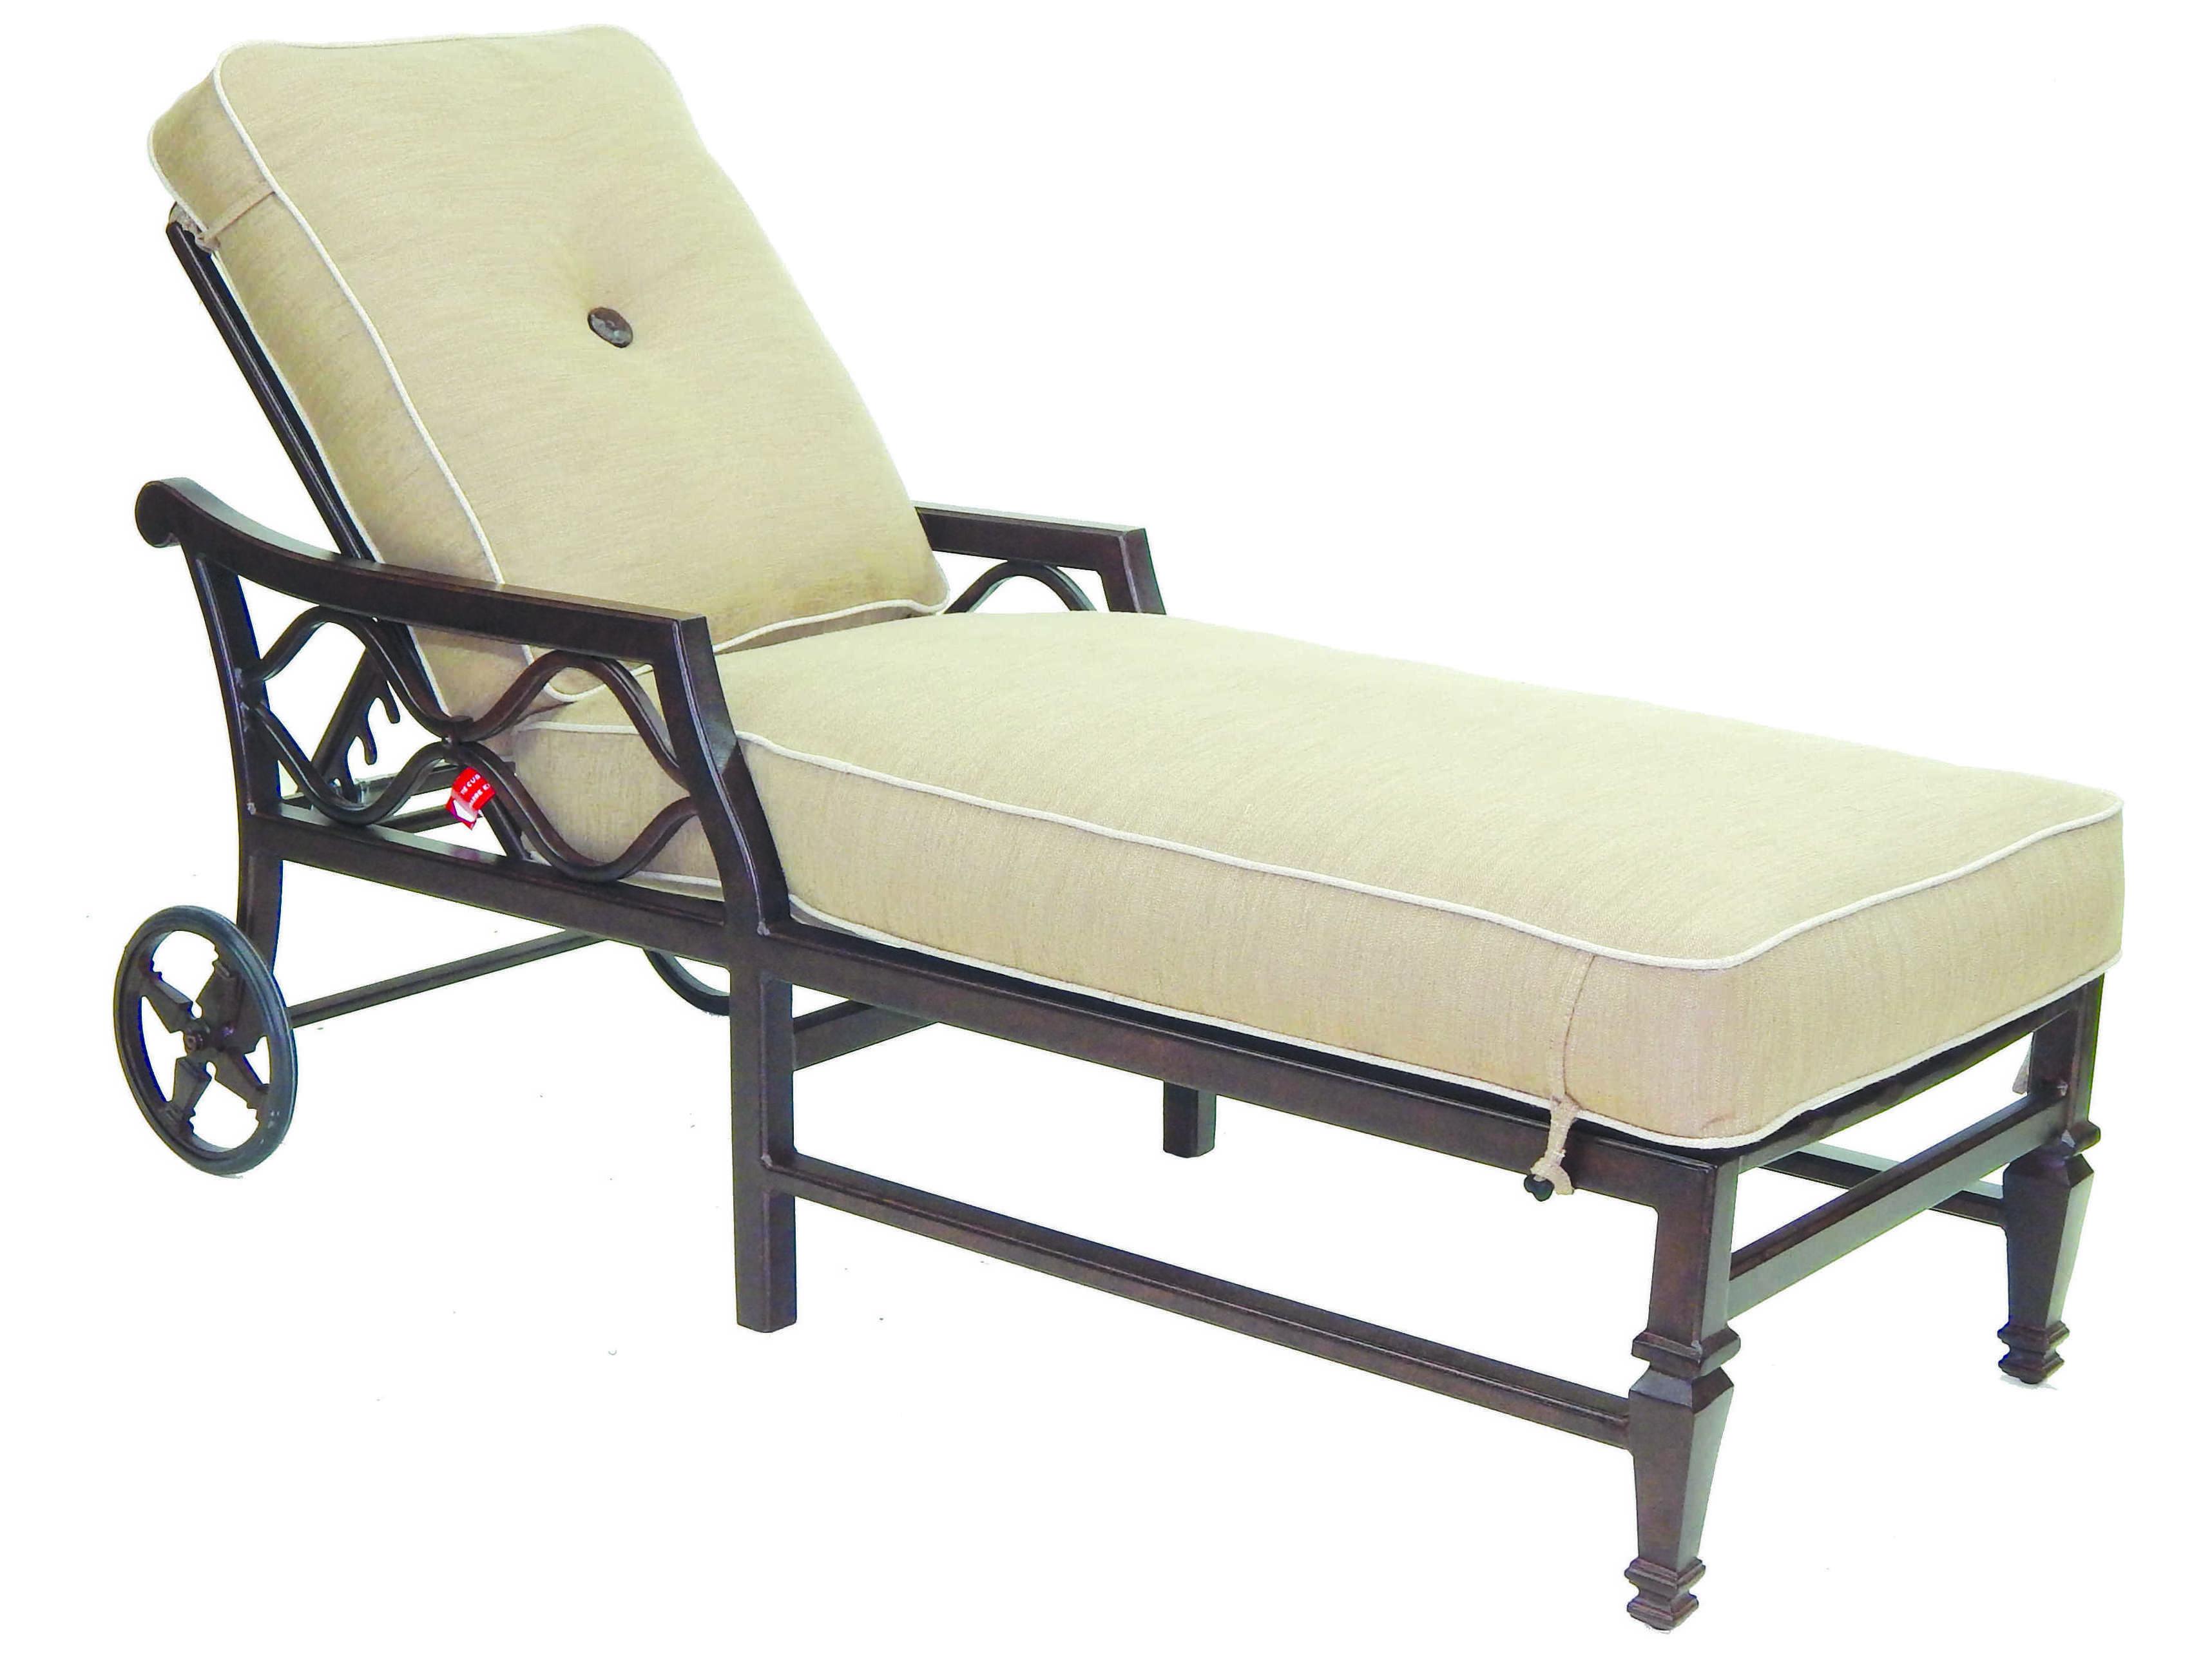 Castelle villa bianca cushion cast aluminum adjustable for Cast aluminum chaise lounge with wheels